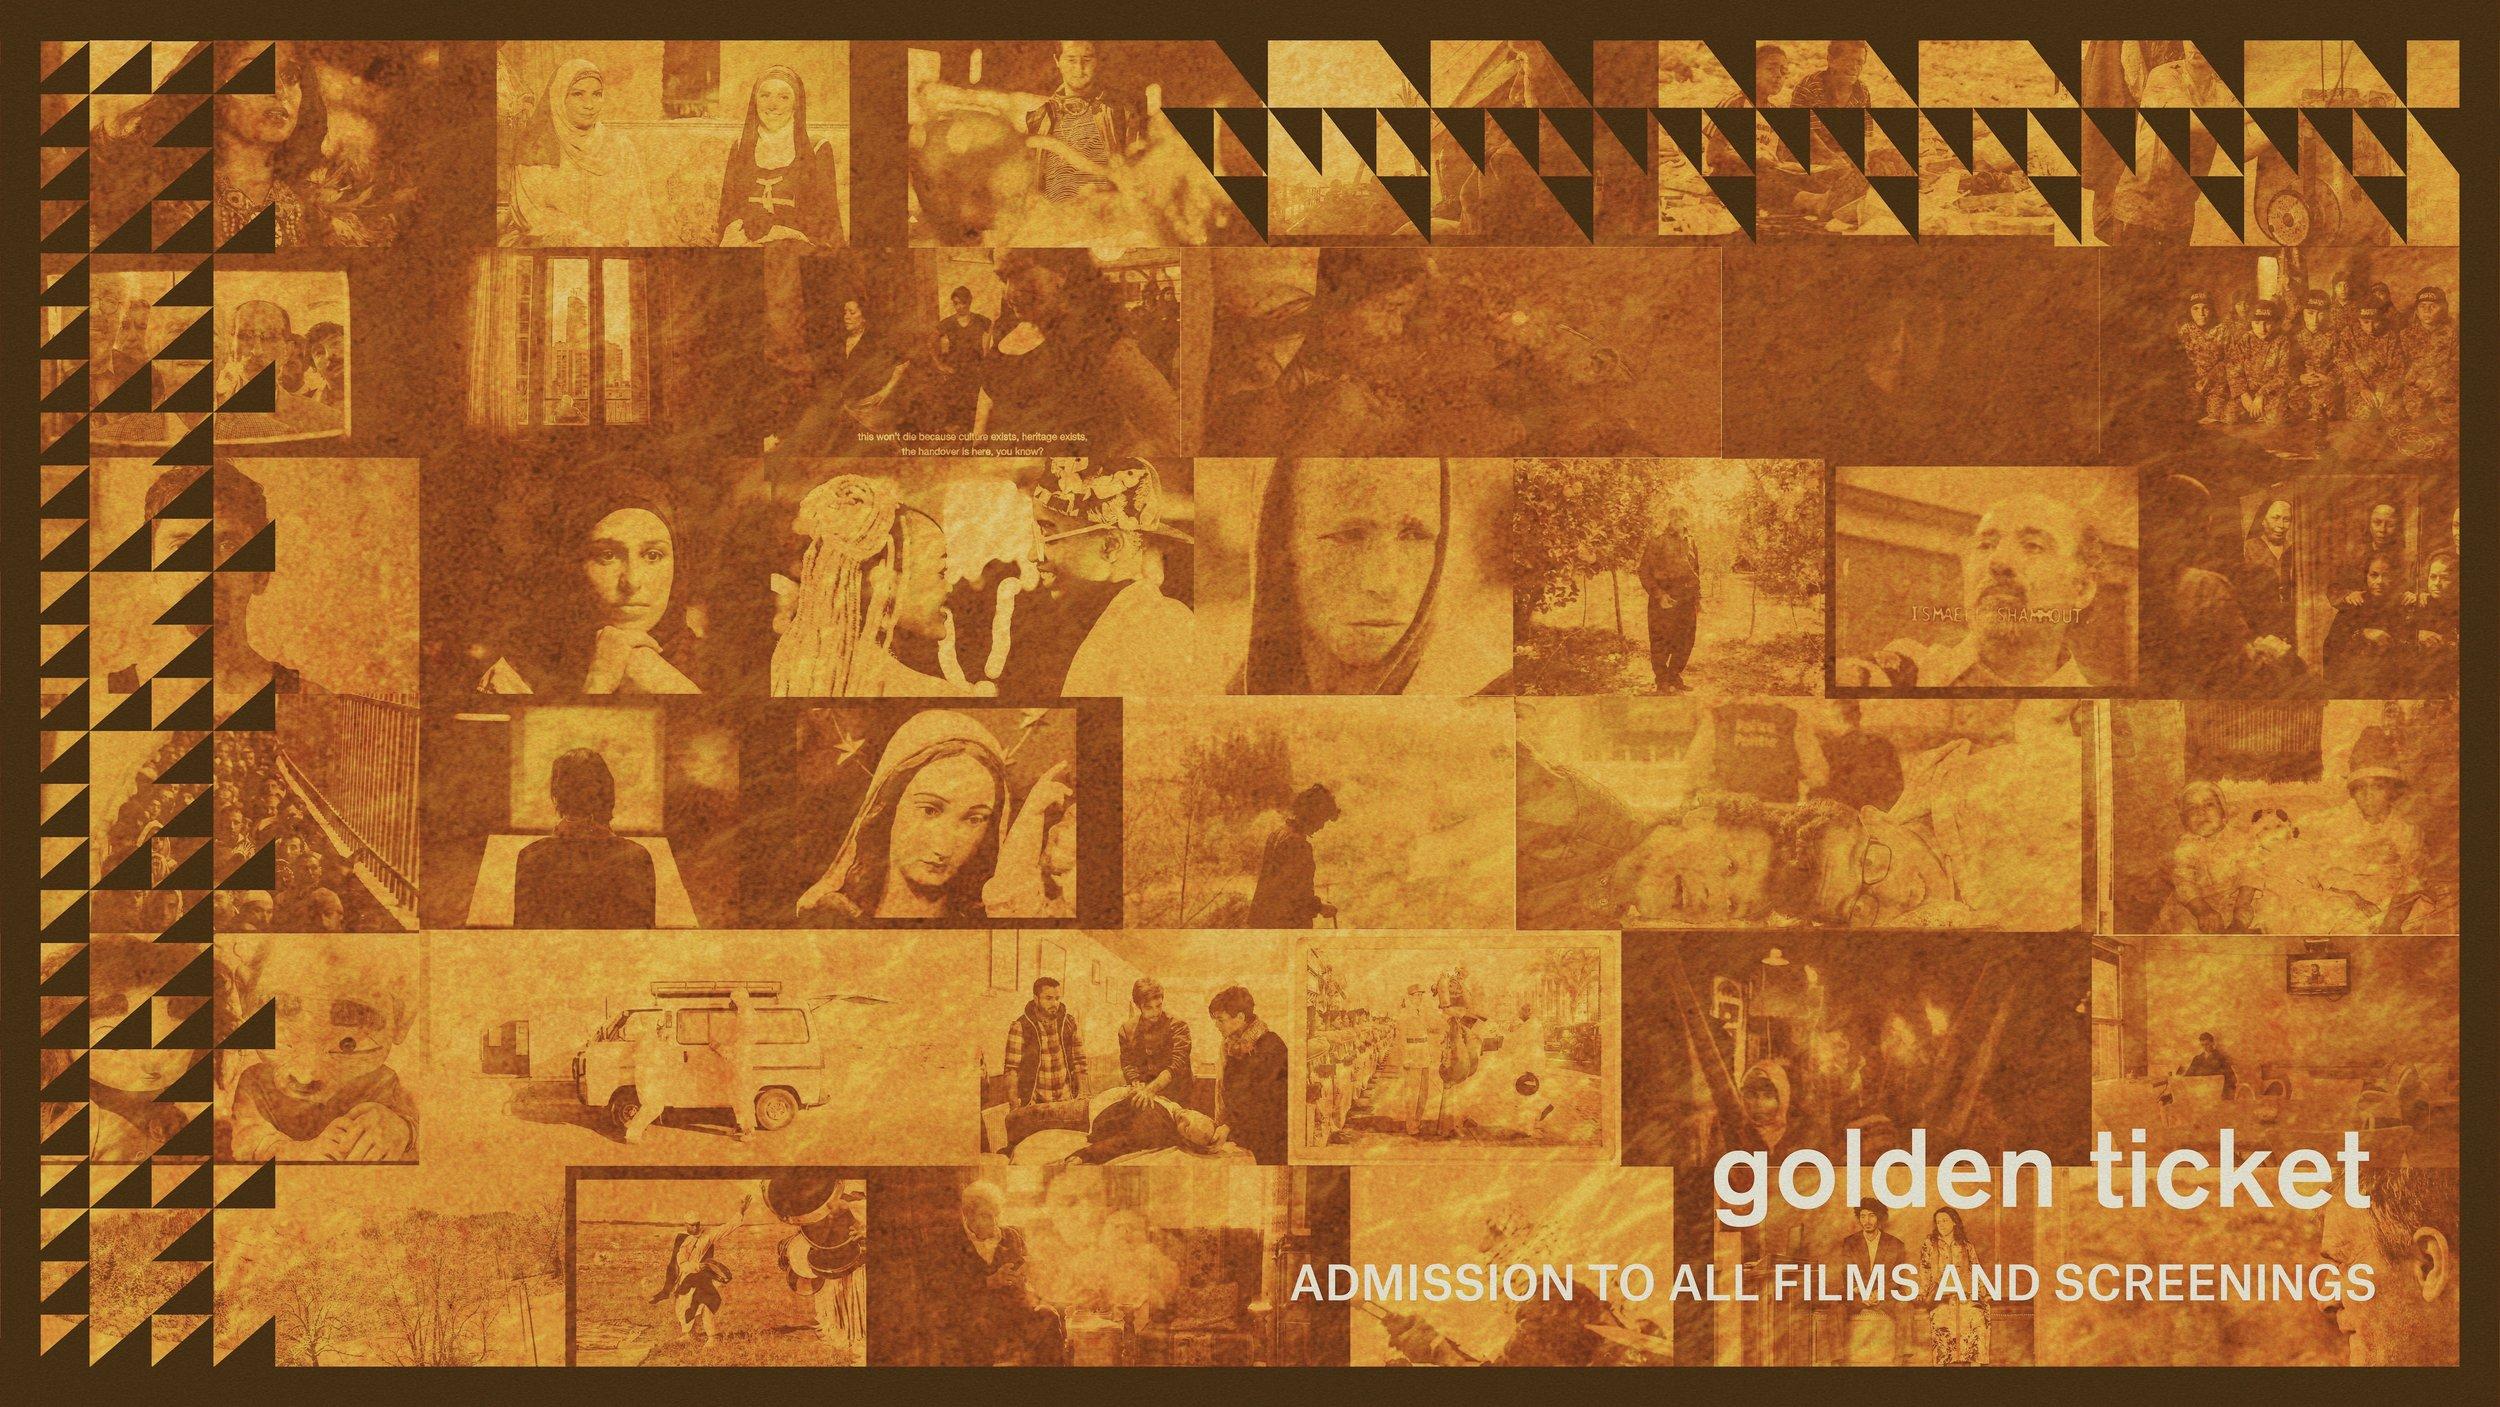 HIFF Golden Pass